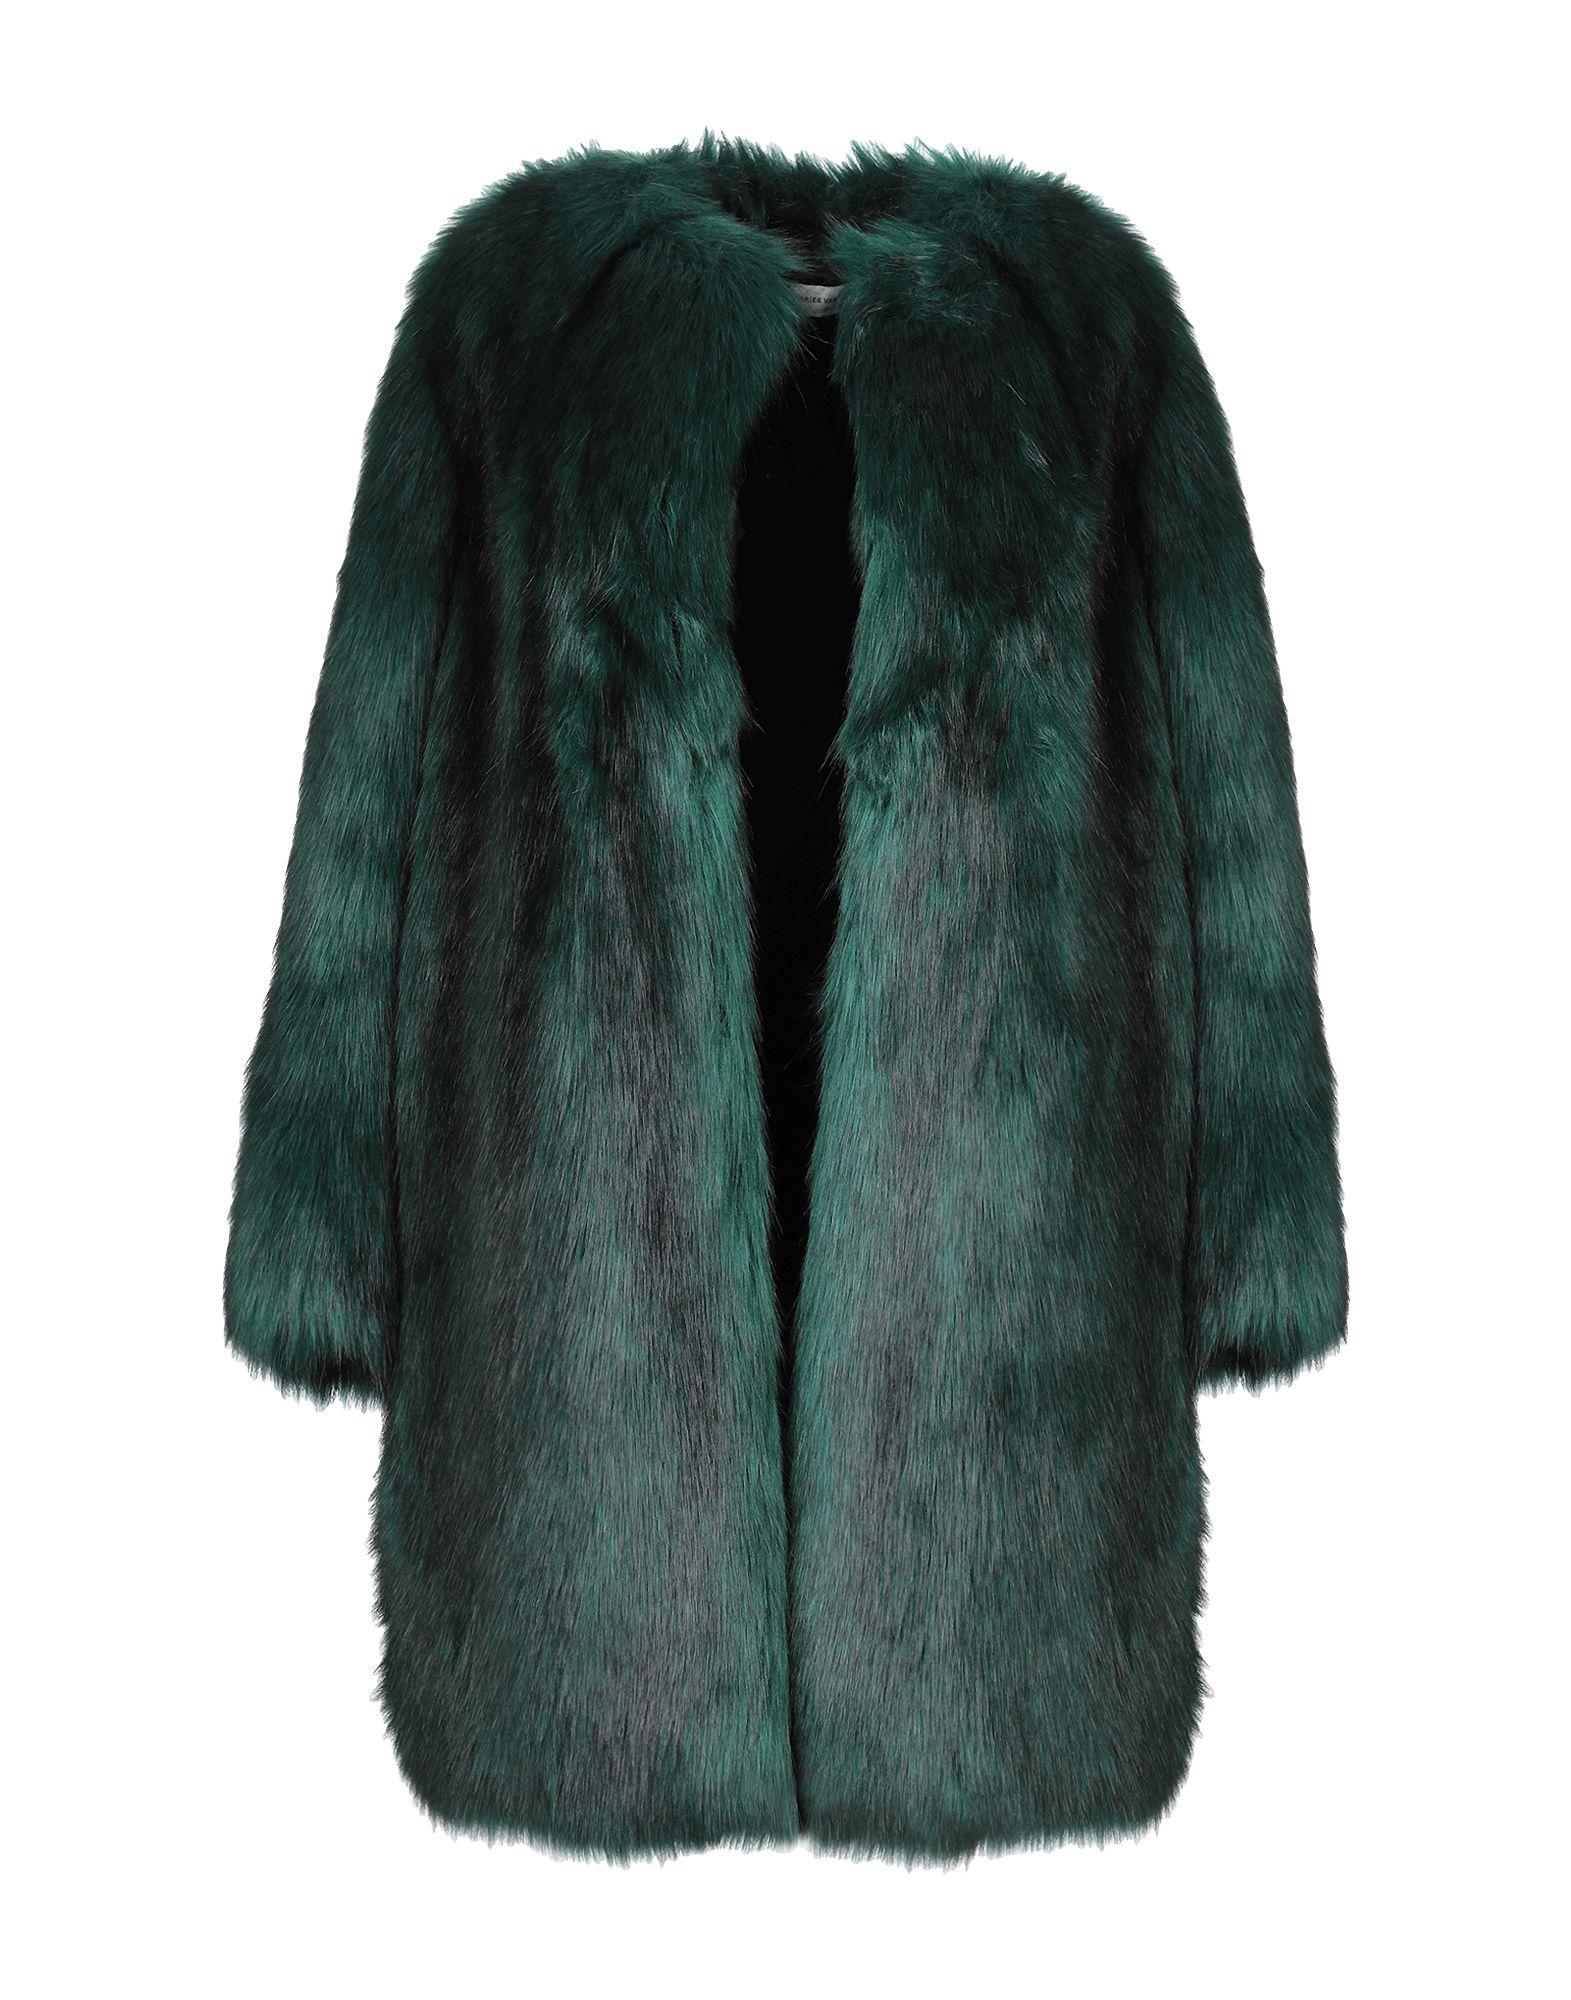 Pellicce ecologiche online  pellicce sintetiche moda  f8b7e02dbca8